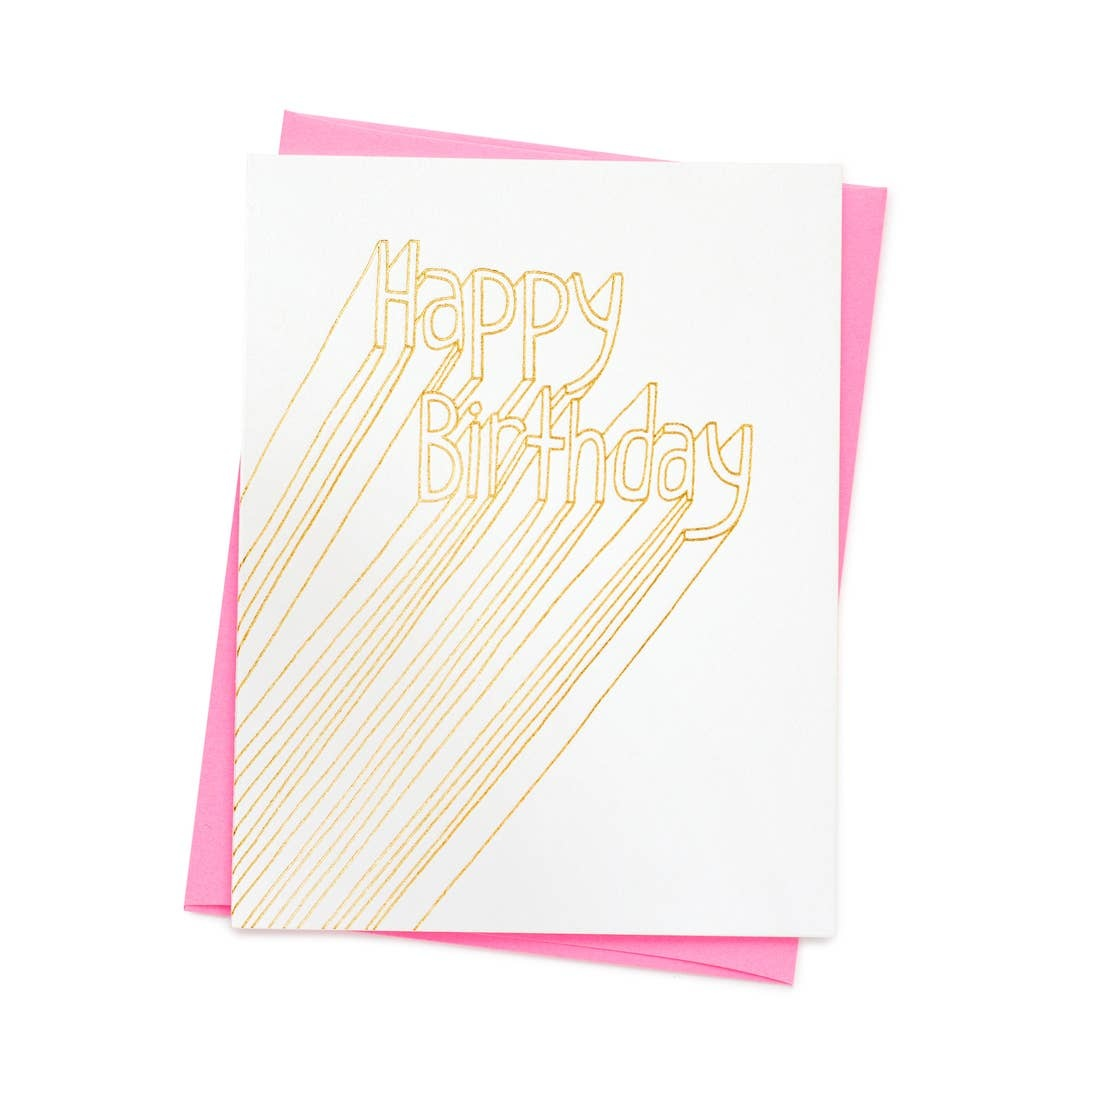 ASHKAHN & CO Happy Birthday Gold Card